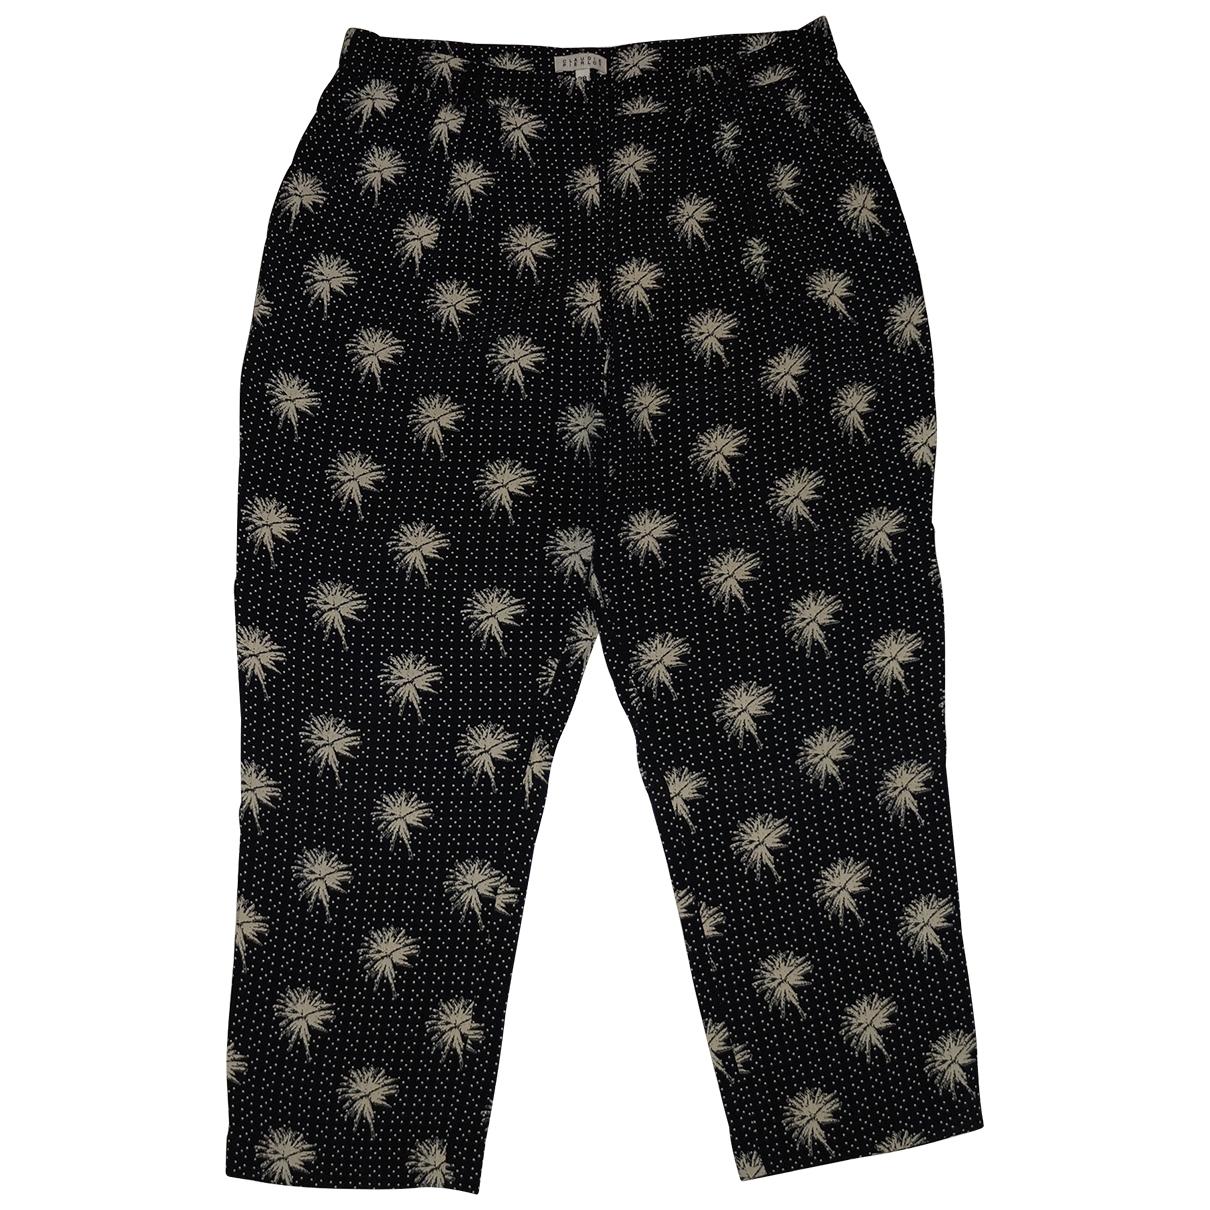 Claudie Pierlot \N Black Trousers for Women 38 FR